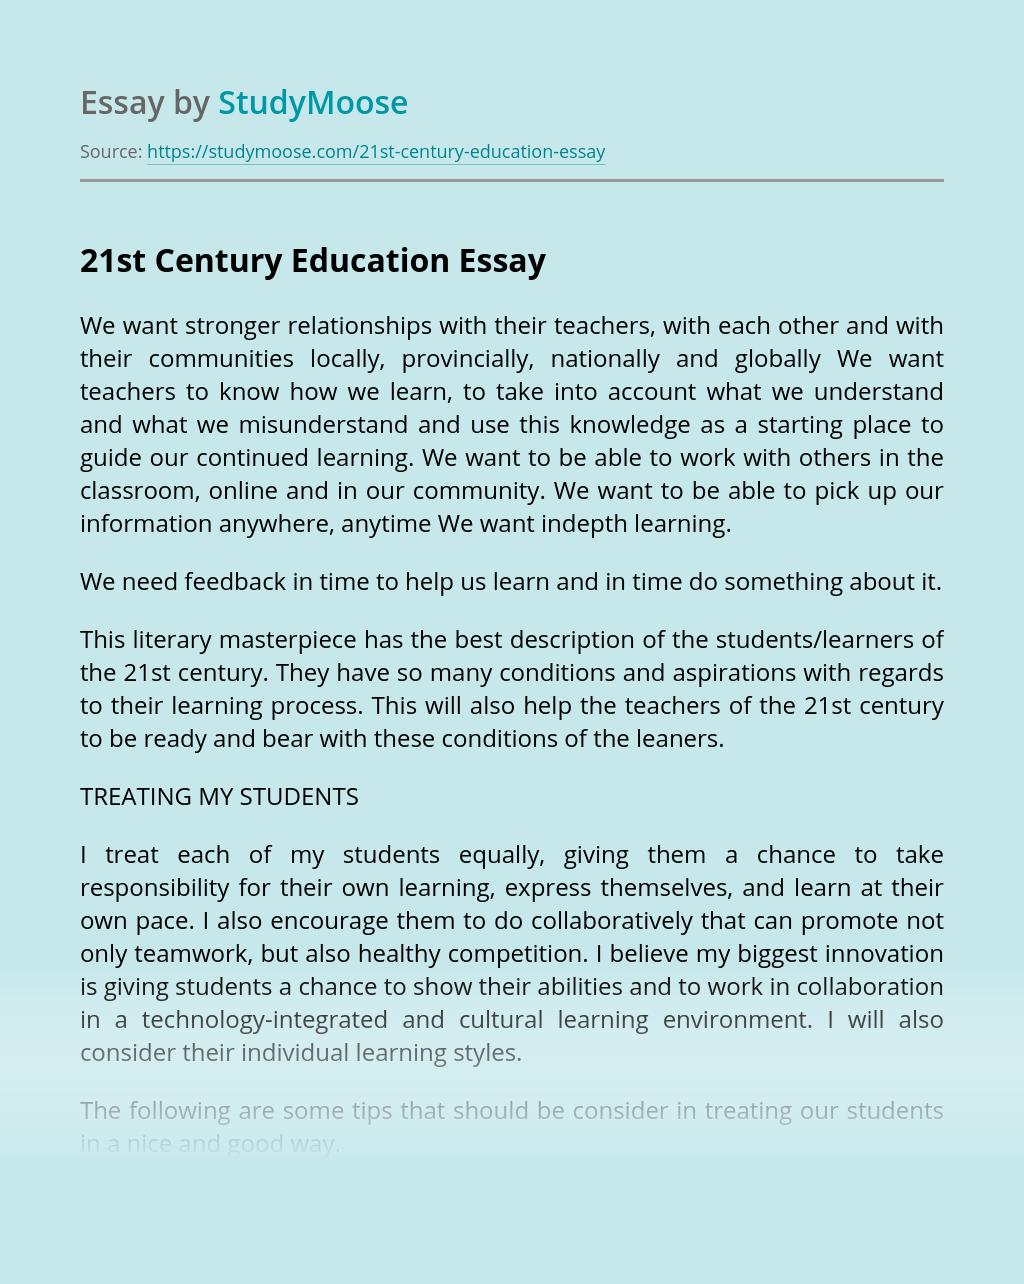 essay on technology in 21st century